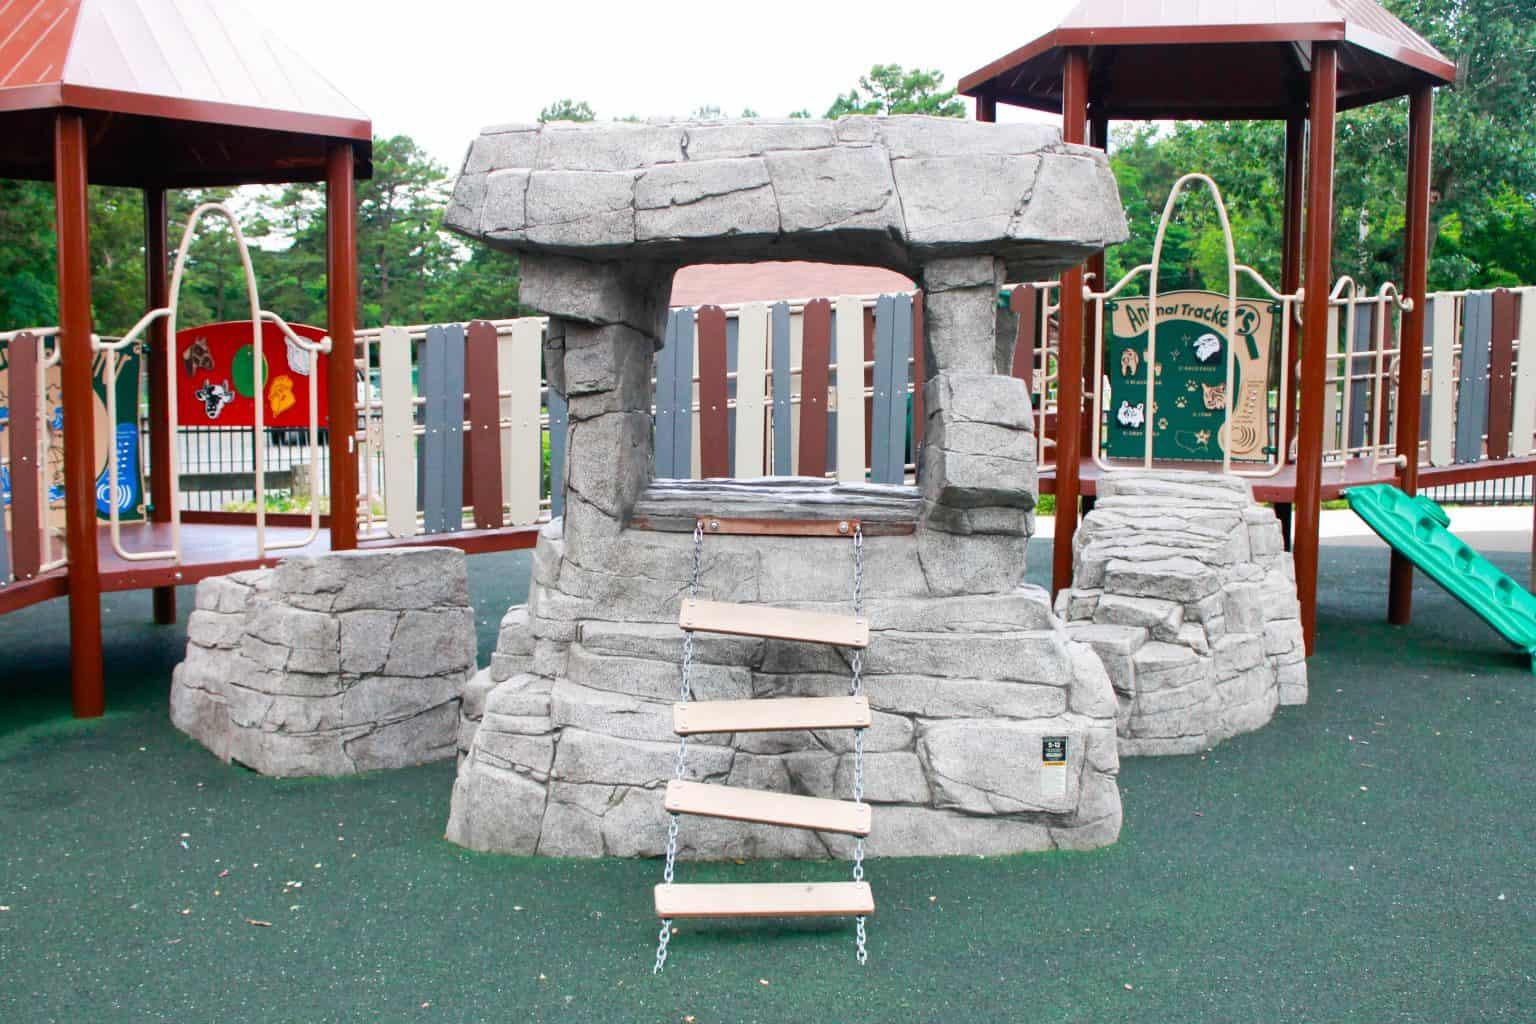 windward-beach-park-playground-brick-nj_28266703355_o-1536x1024